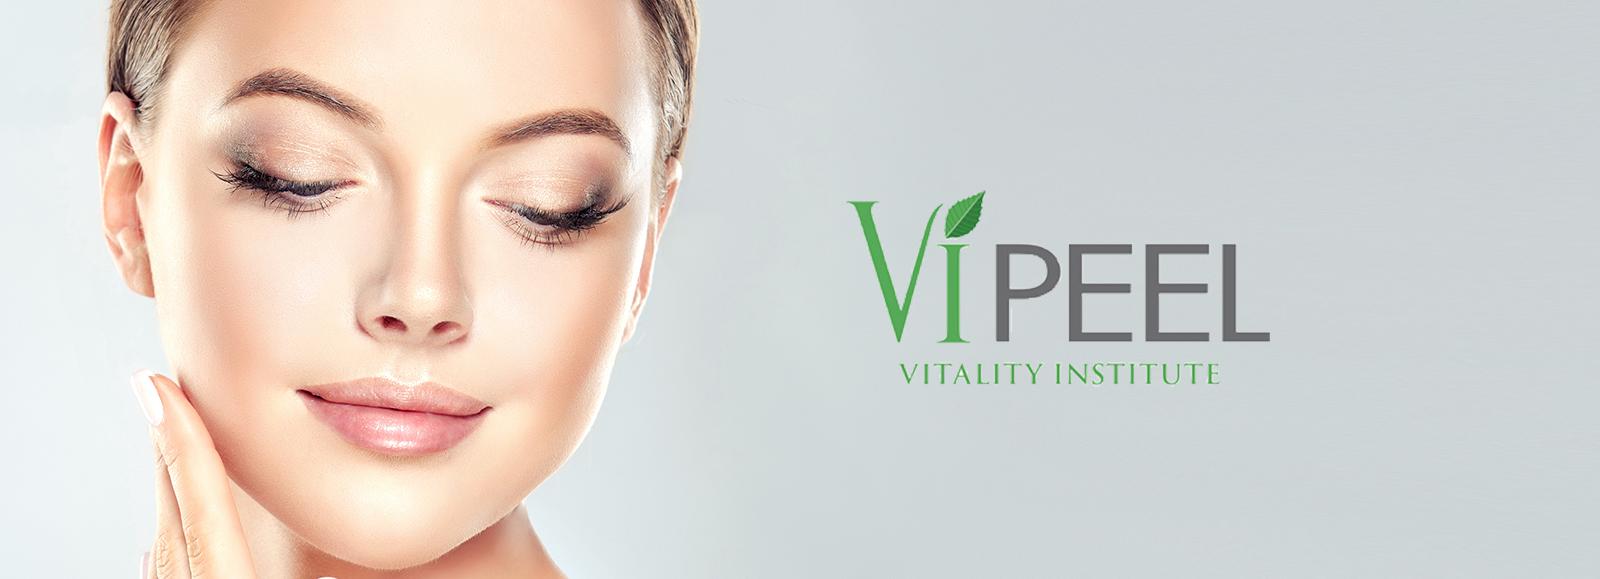 VIPeel